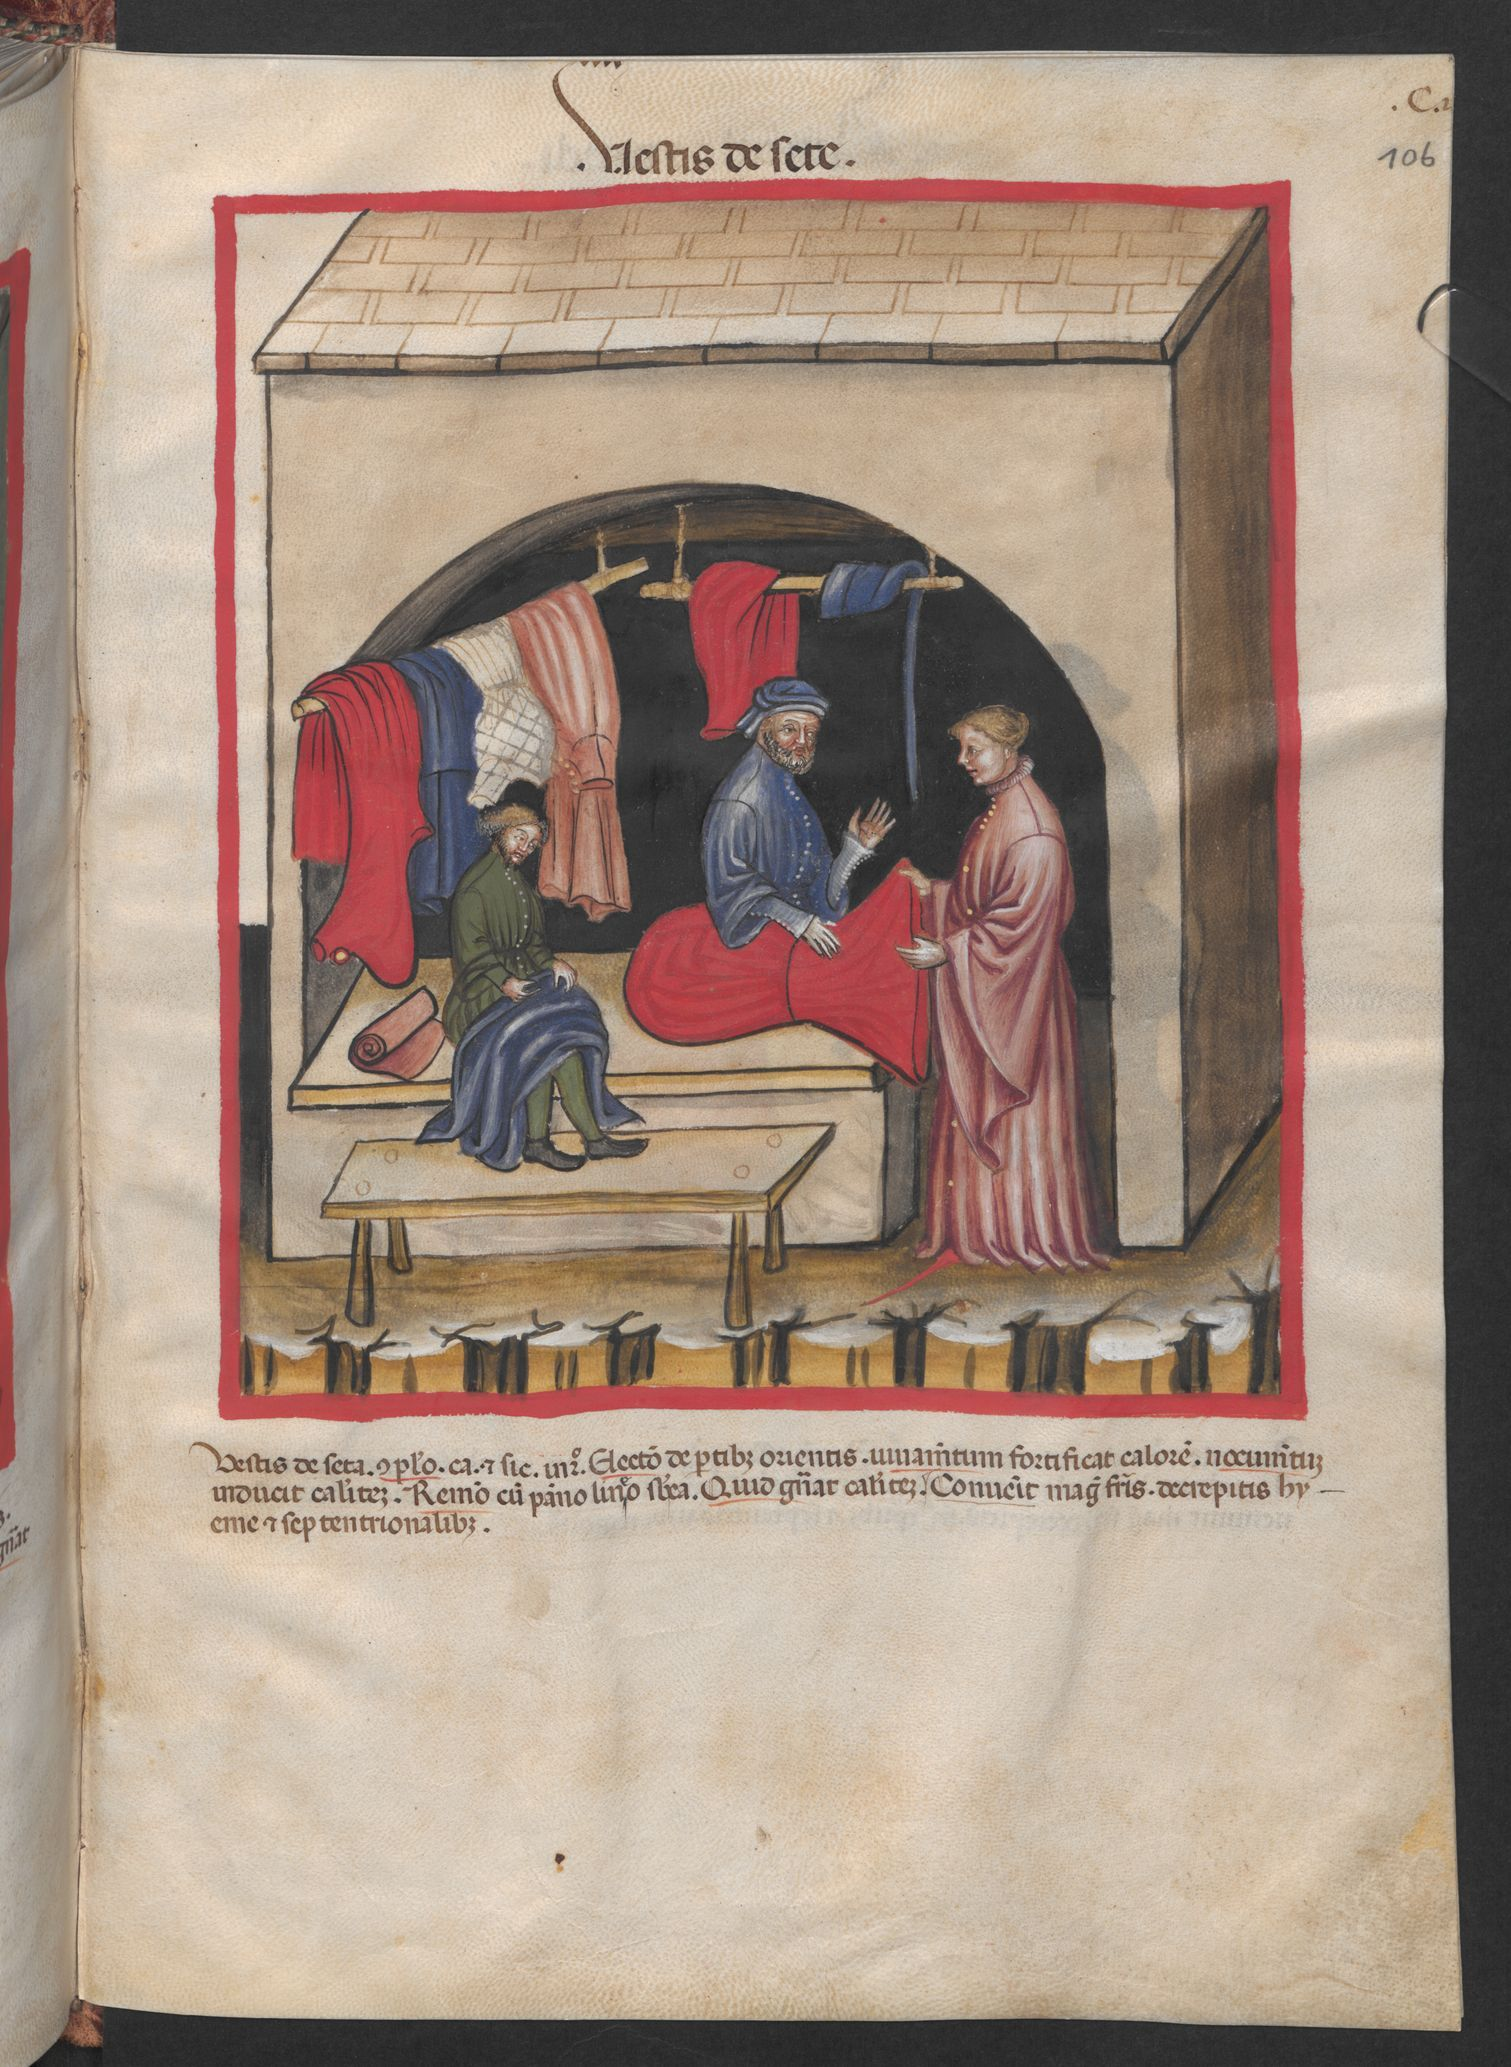 Folio 106r (page 215). Tacuinum sanitatis, Codex Vindobonensis, series nova 2644. North Italy, probably Verona, 1380-1399.